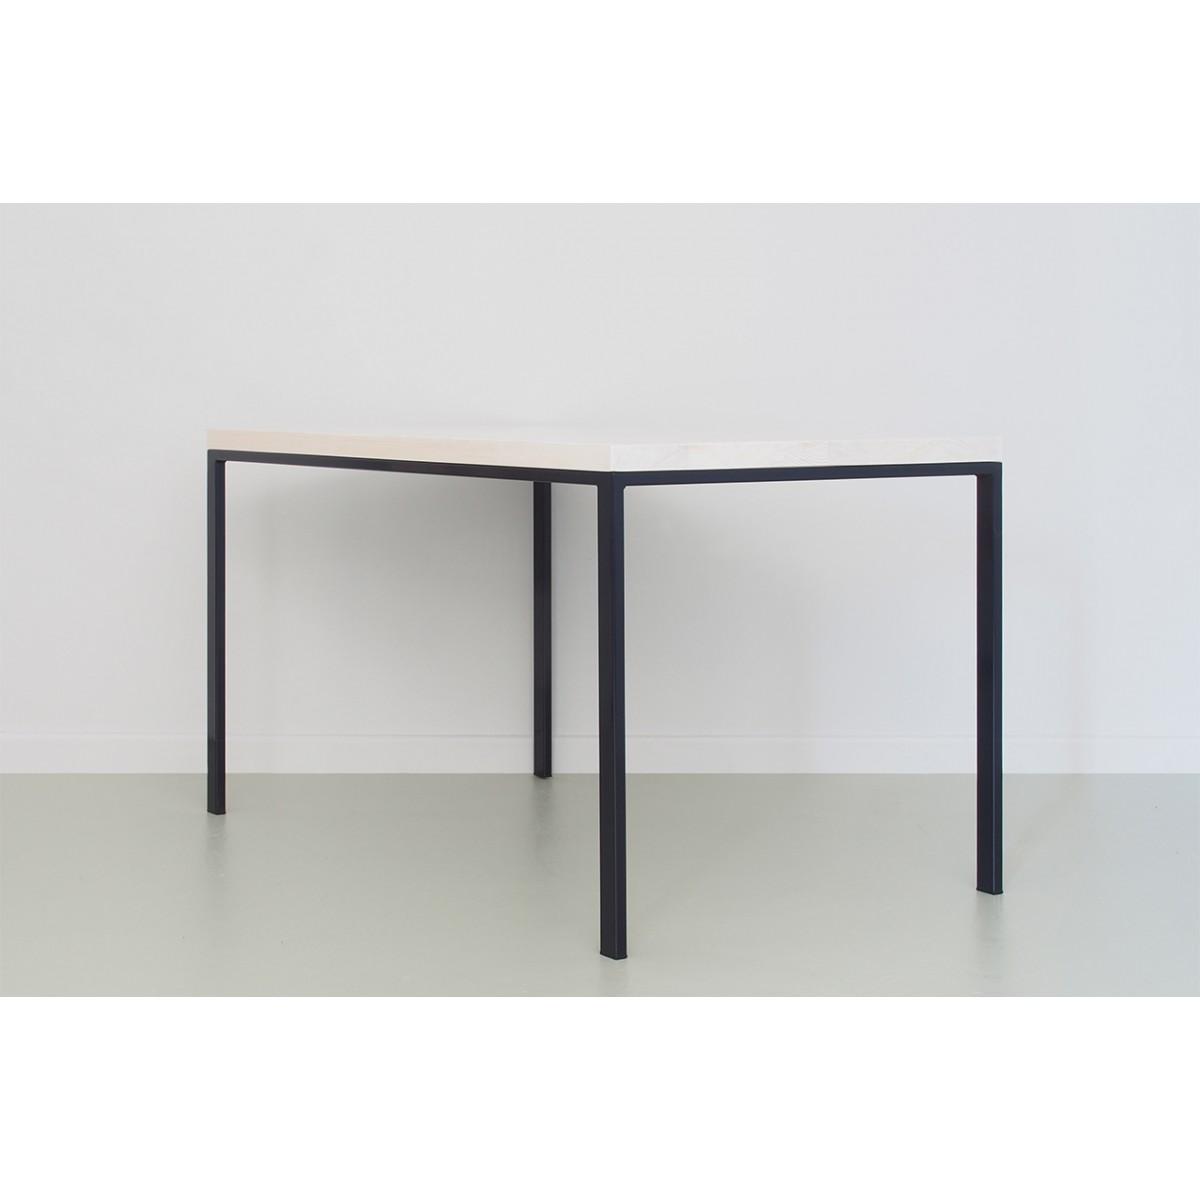 Tisch SIMPELVELD Schwarzblau | JOHANENLIES